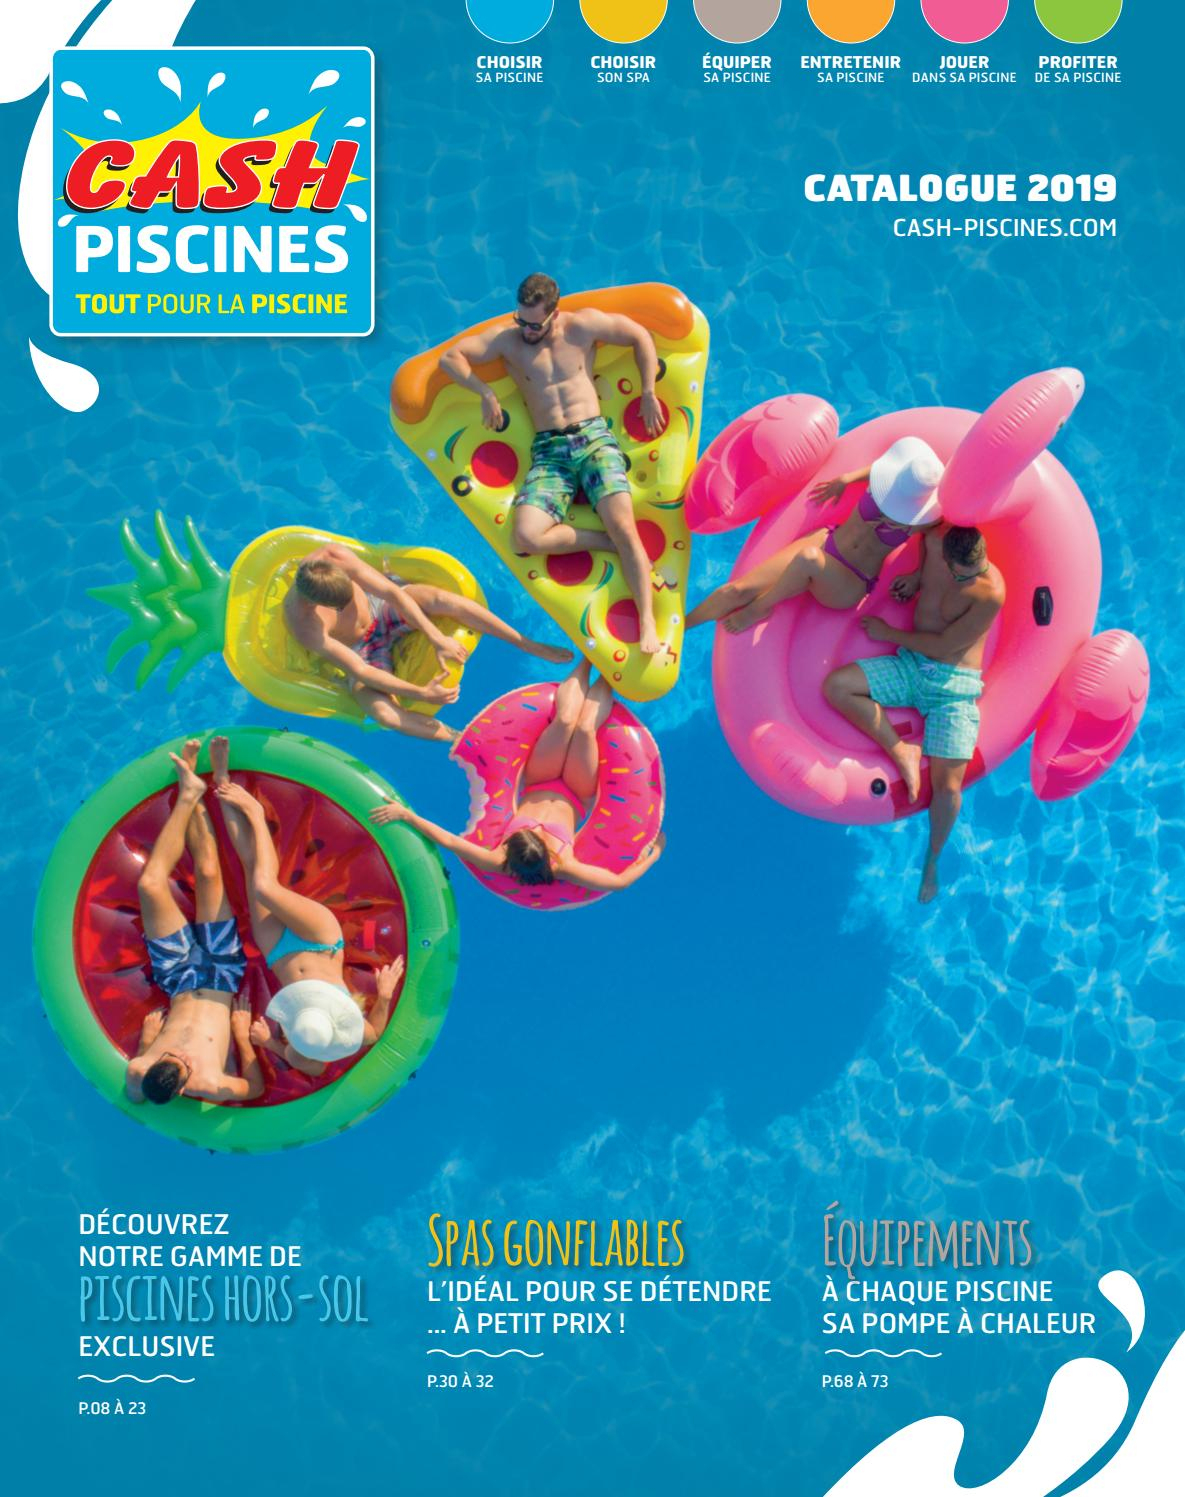 Catalogue Cash Piscines 2019 By Cashpiscines2 - Issuu avec Cash Piscine Montauban